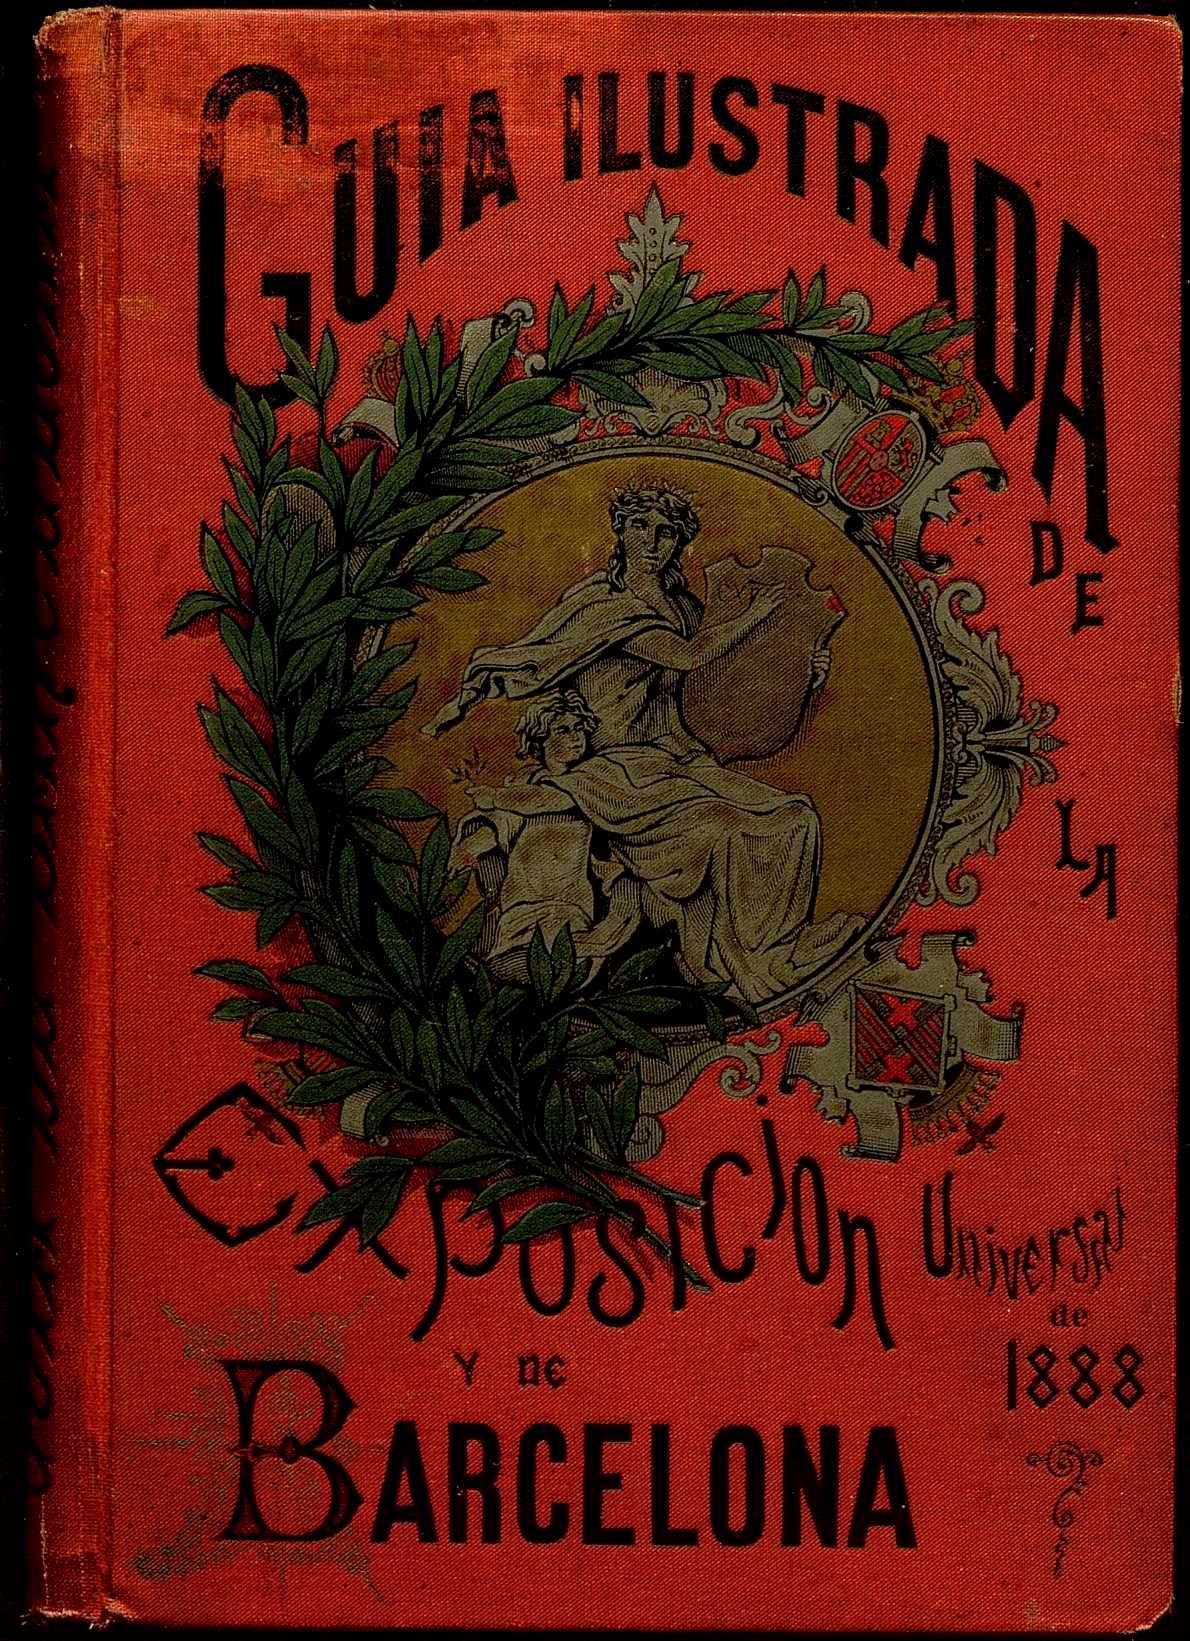 Coberta cromolitografiada de la Guía Ilustrada, de Valero de Tornos. Lit. S.Krakow, París.